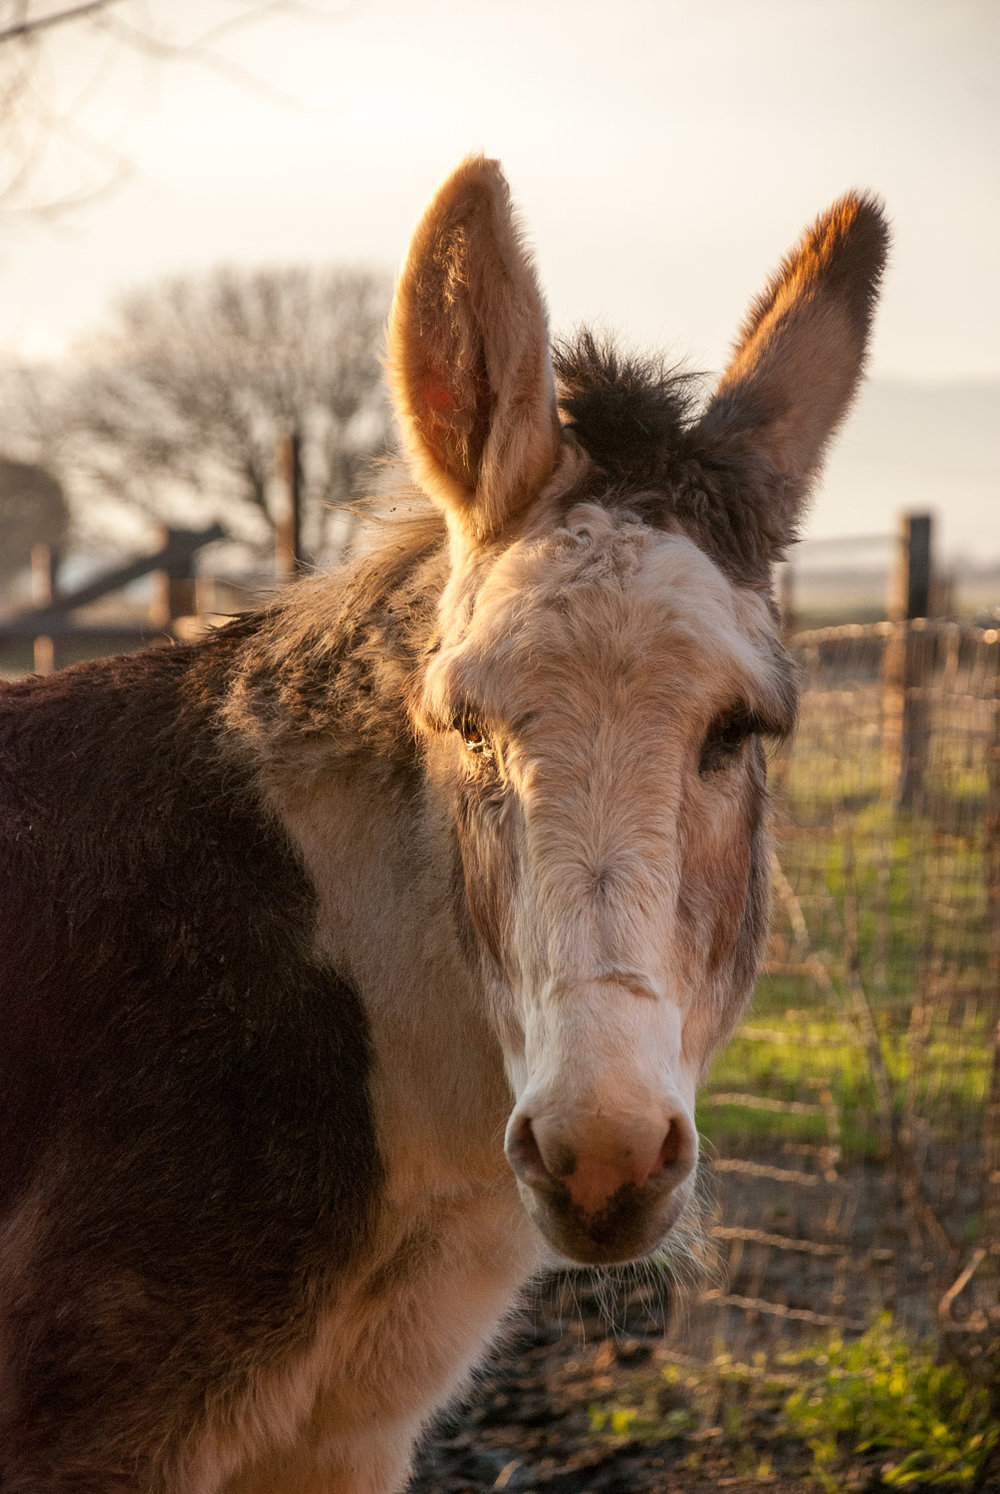 Donkey view.